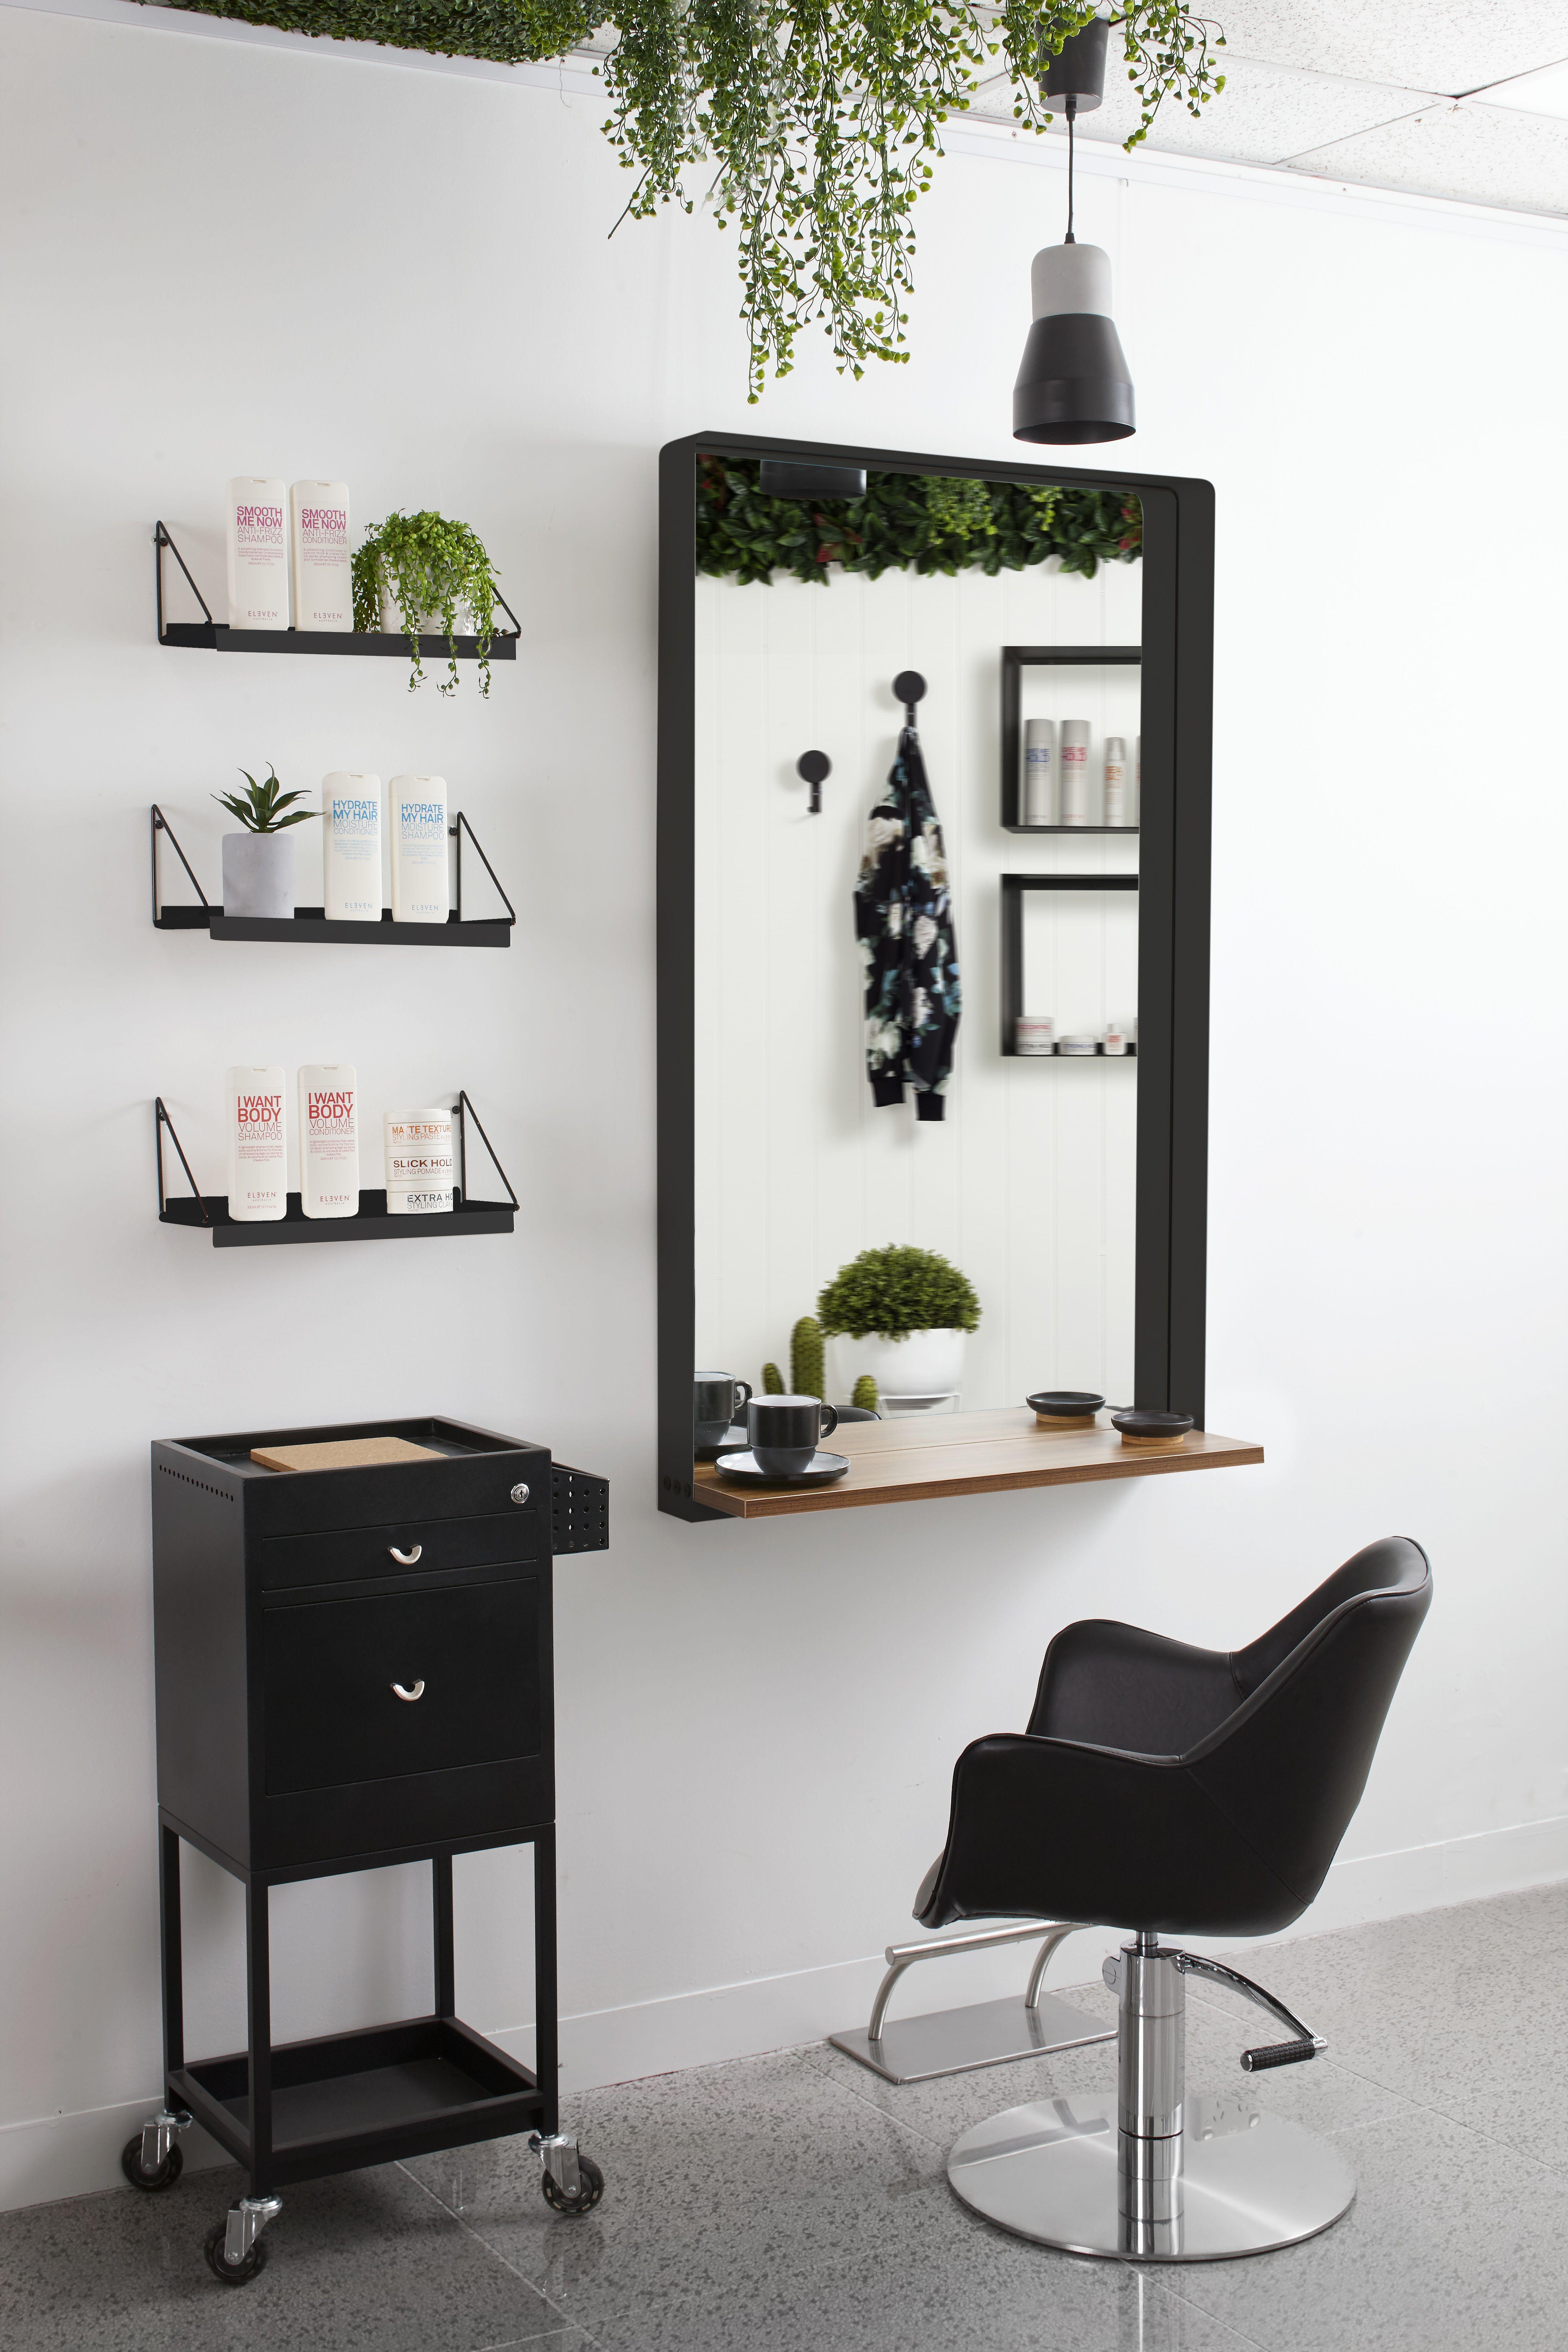 Salon Interior Design Ideas Urban Jungle Salon Furniture